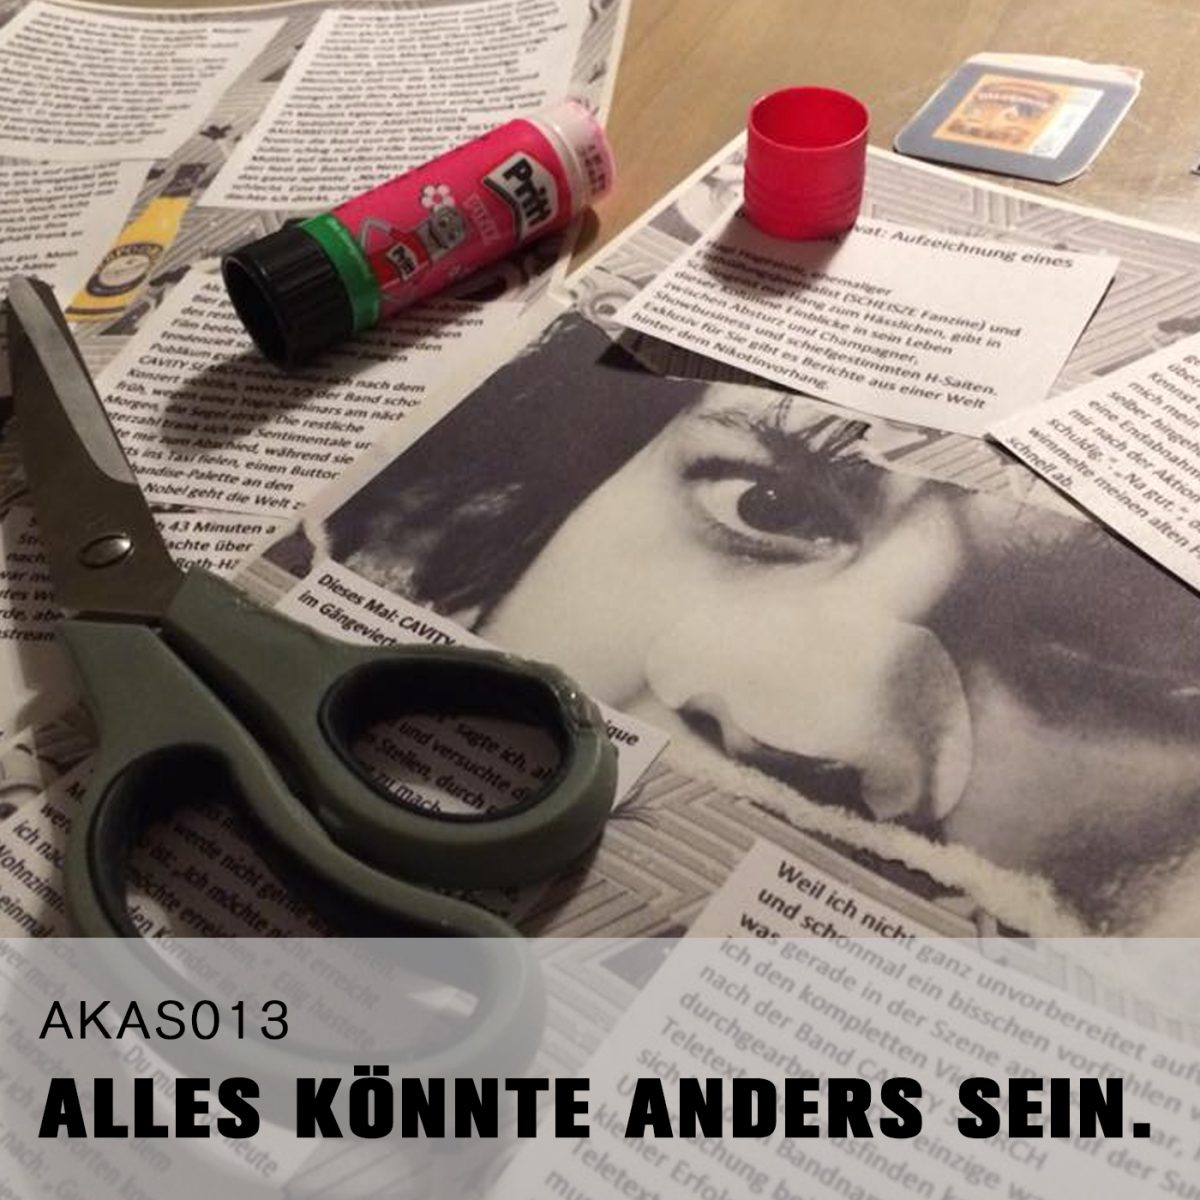 AKAS013 Achtung, Lücke!